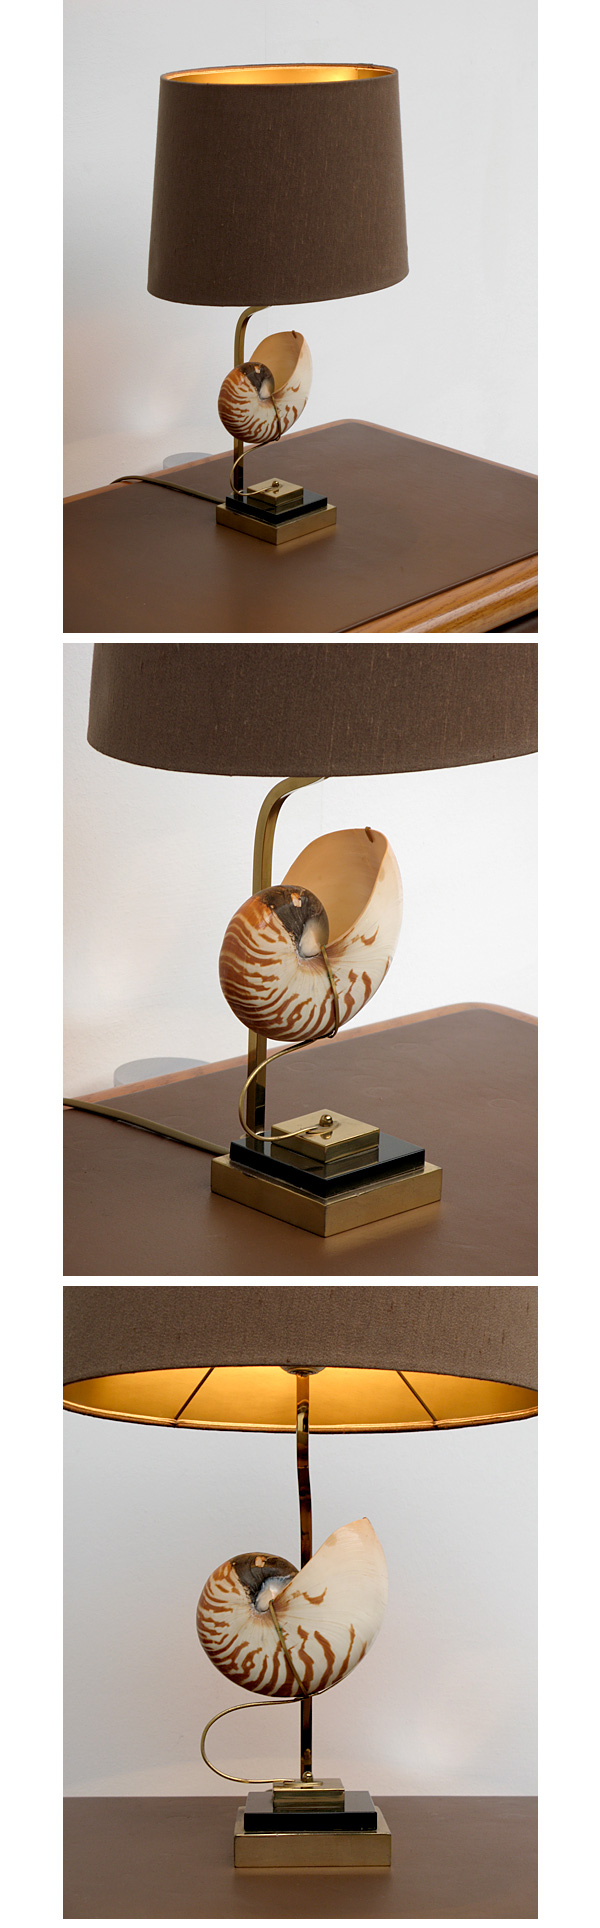 1970s, sea, shell, table, lamp, brown, shade